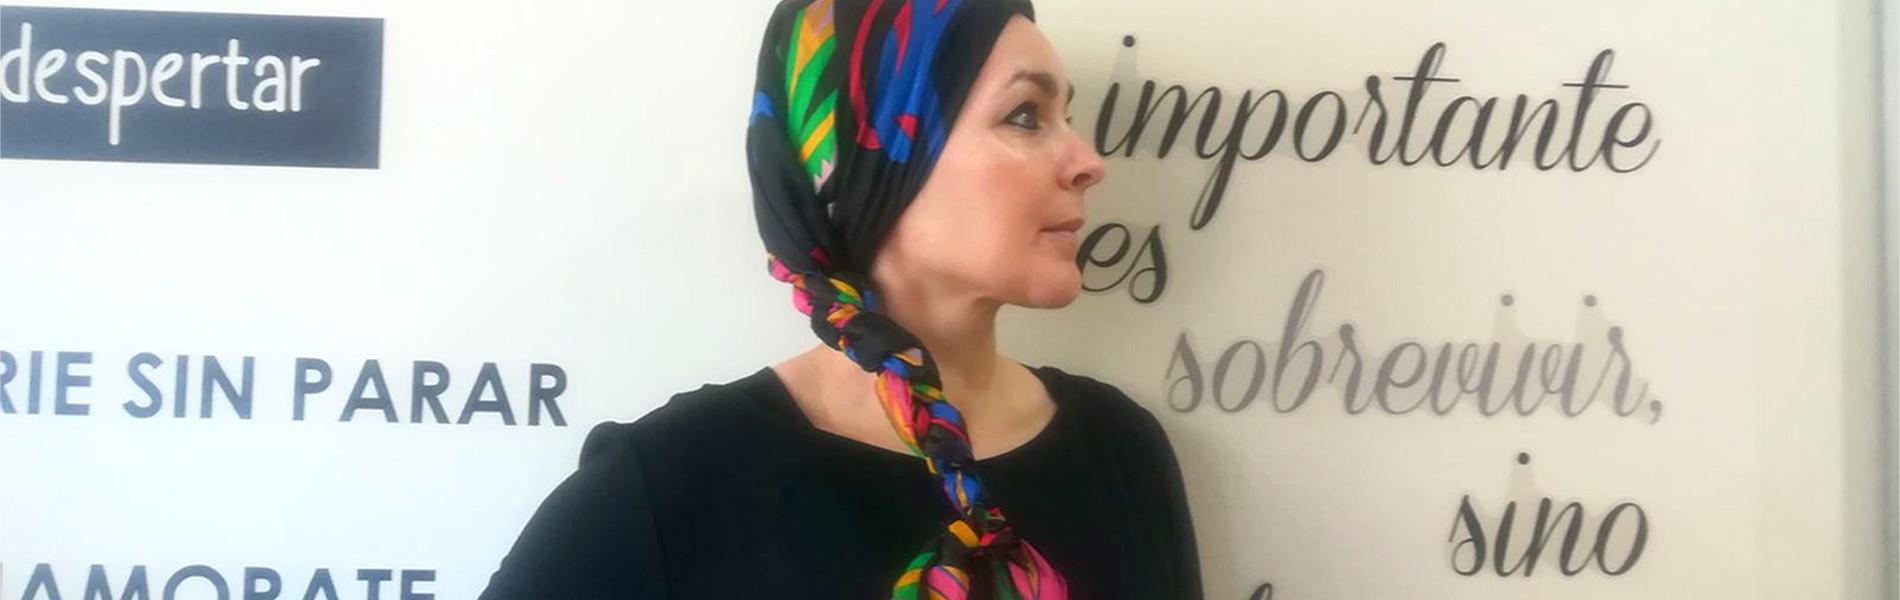 banner-peluqueria-oncologica